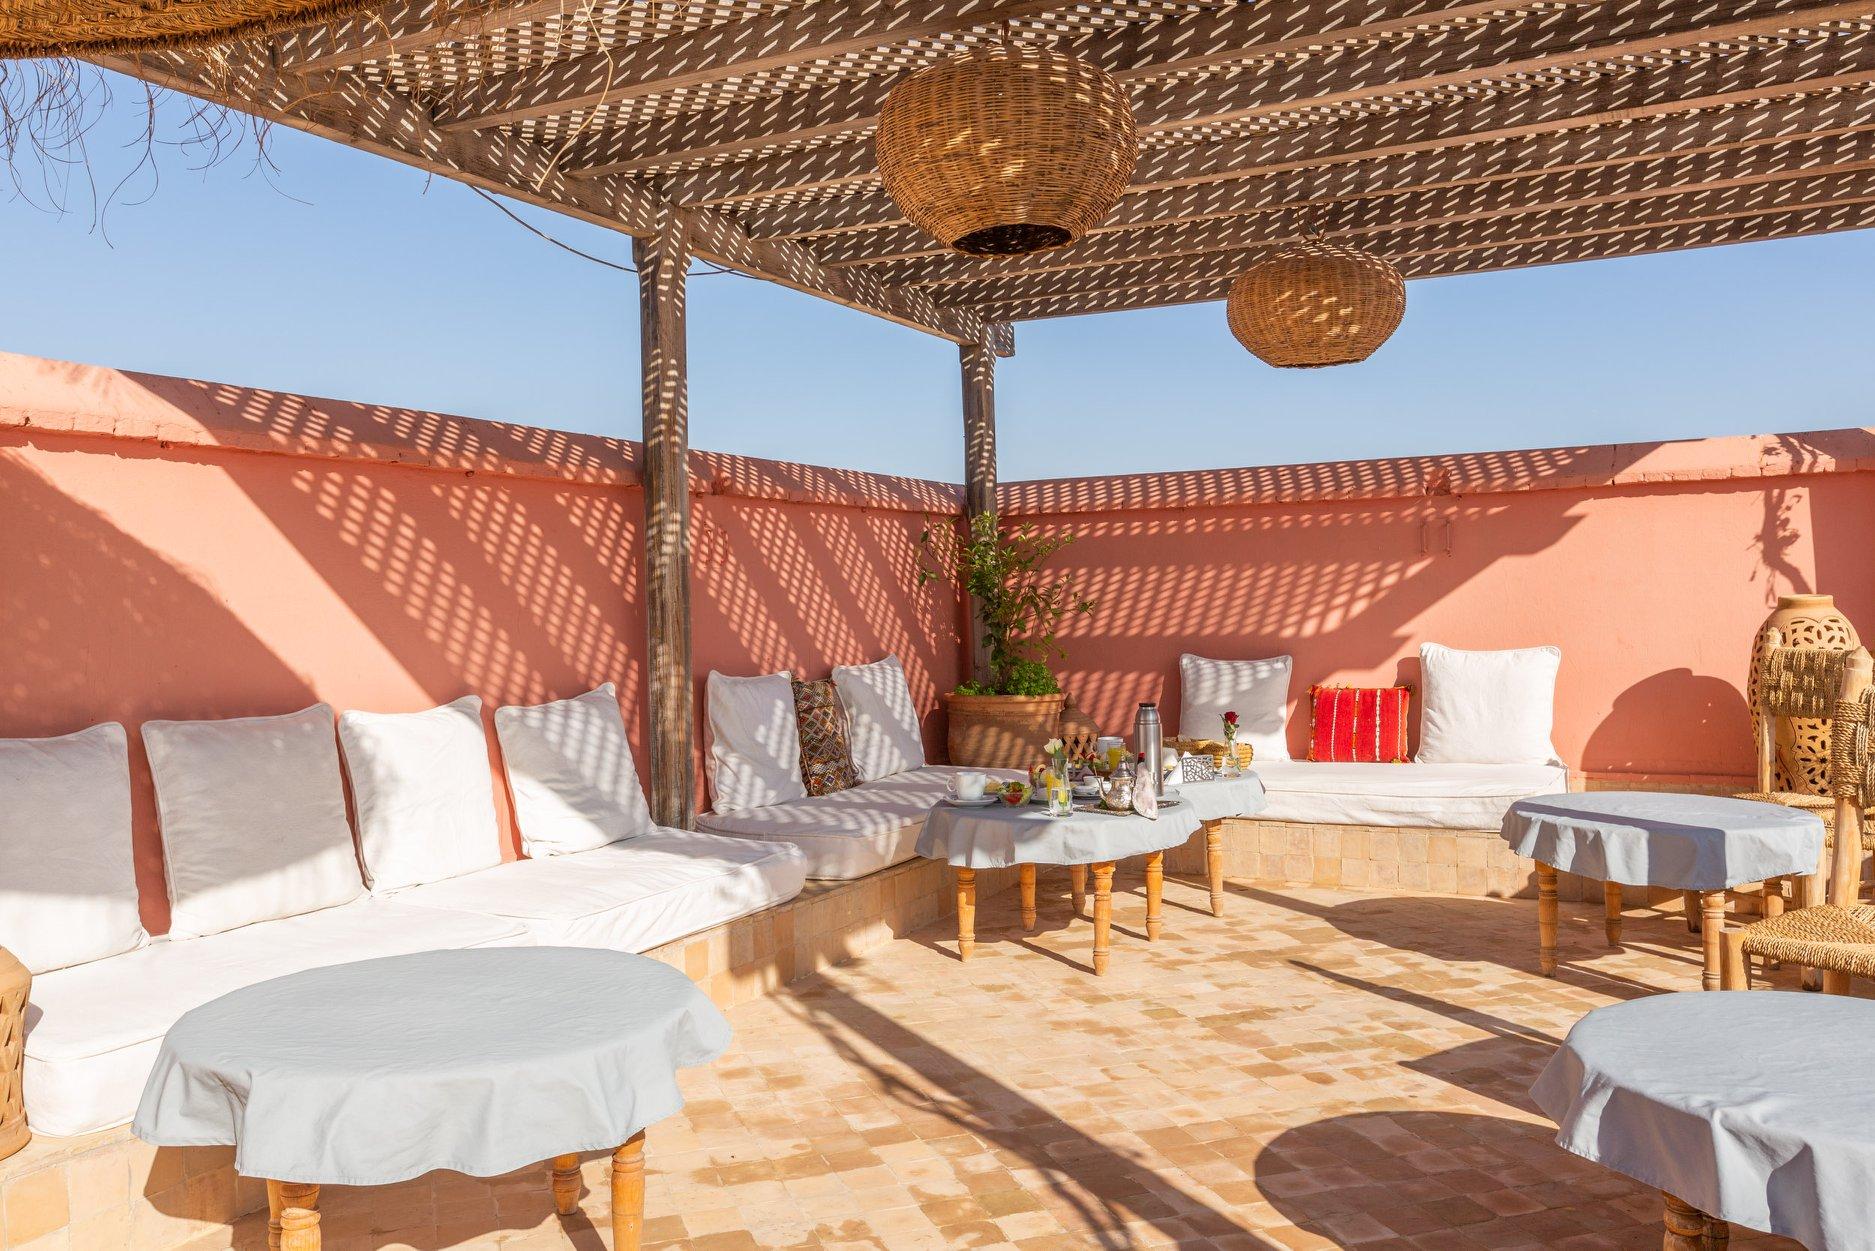 The_best_riads_in_marrakech_riad_Tchaikana